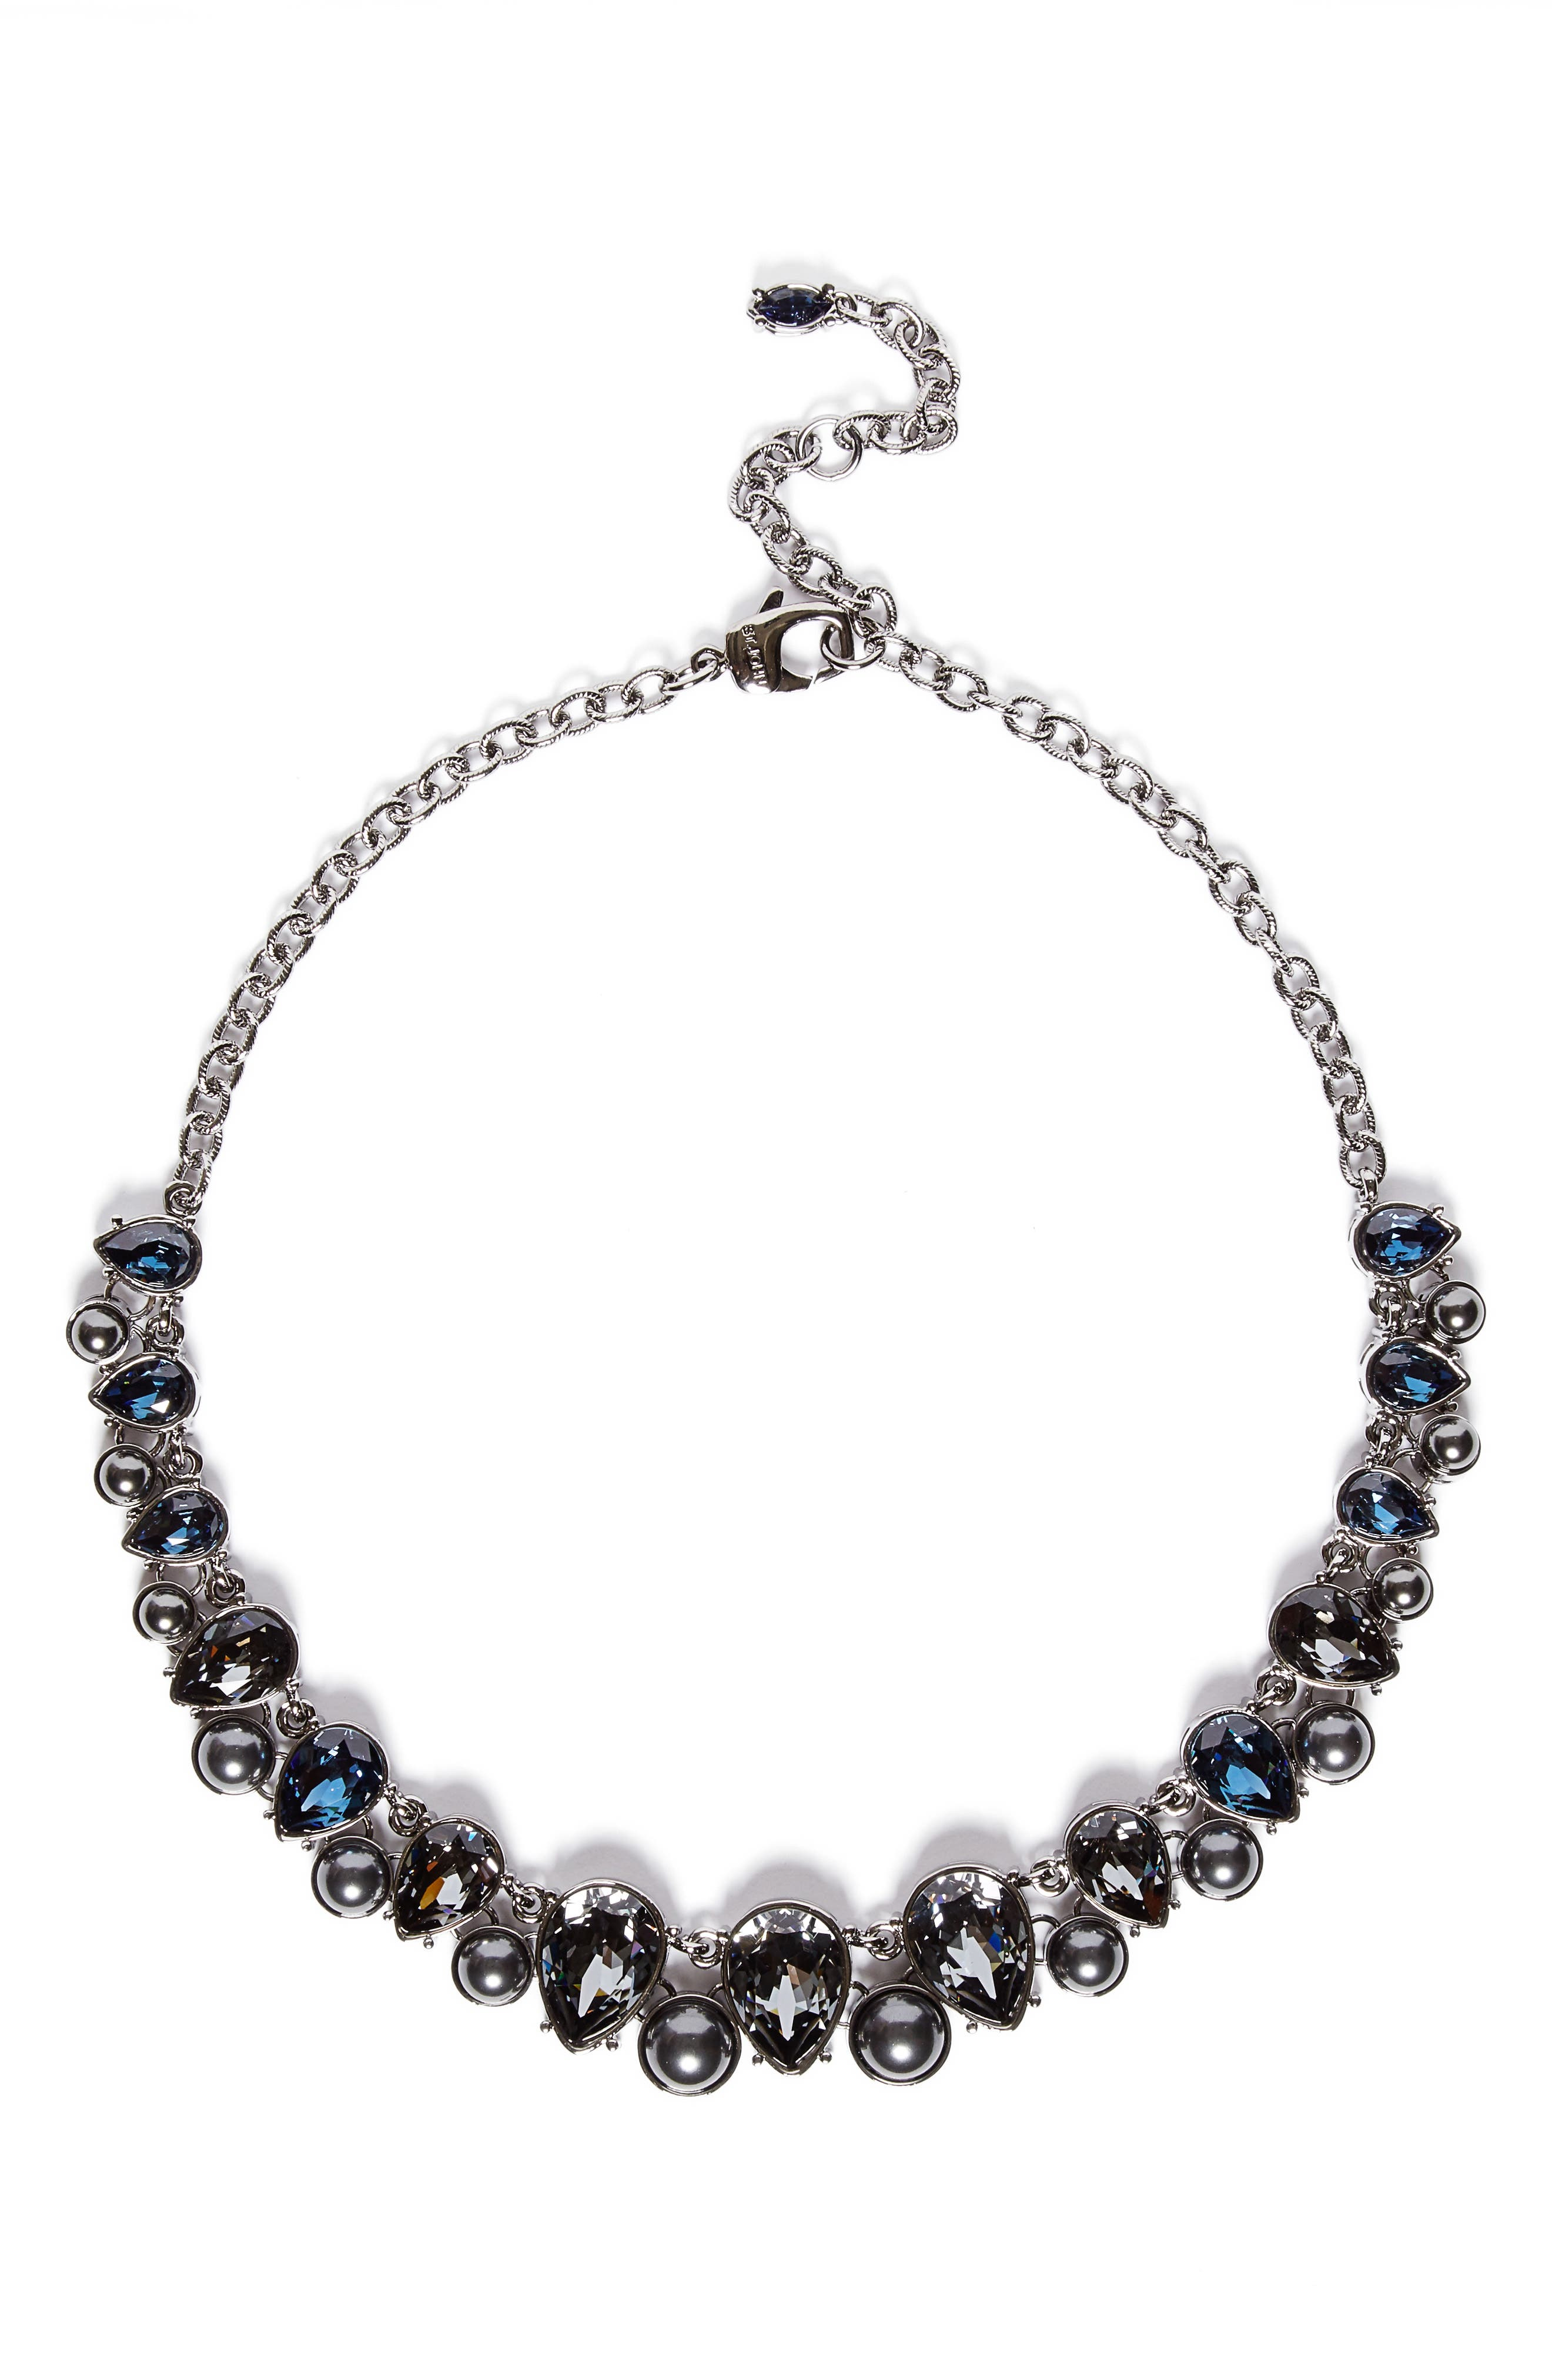 St. John Collection Swarovski Crystal & Imitation Pearl Necklace